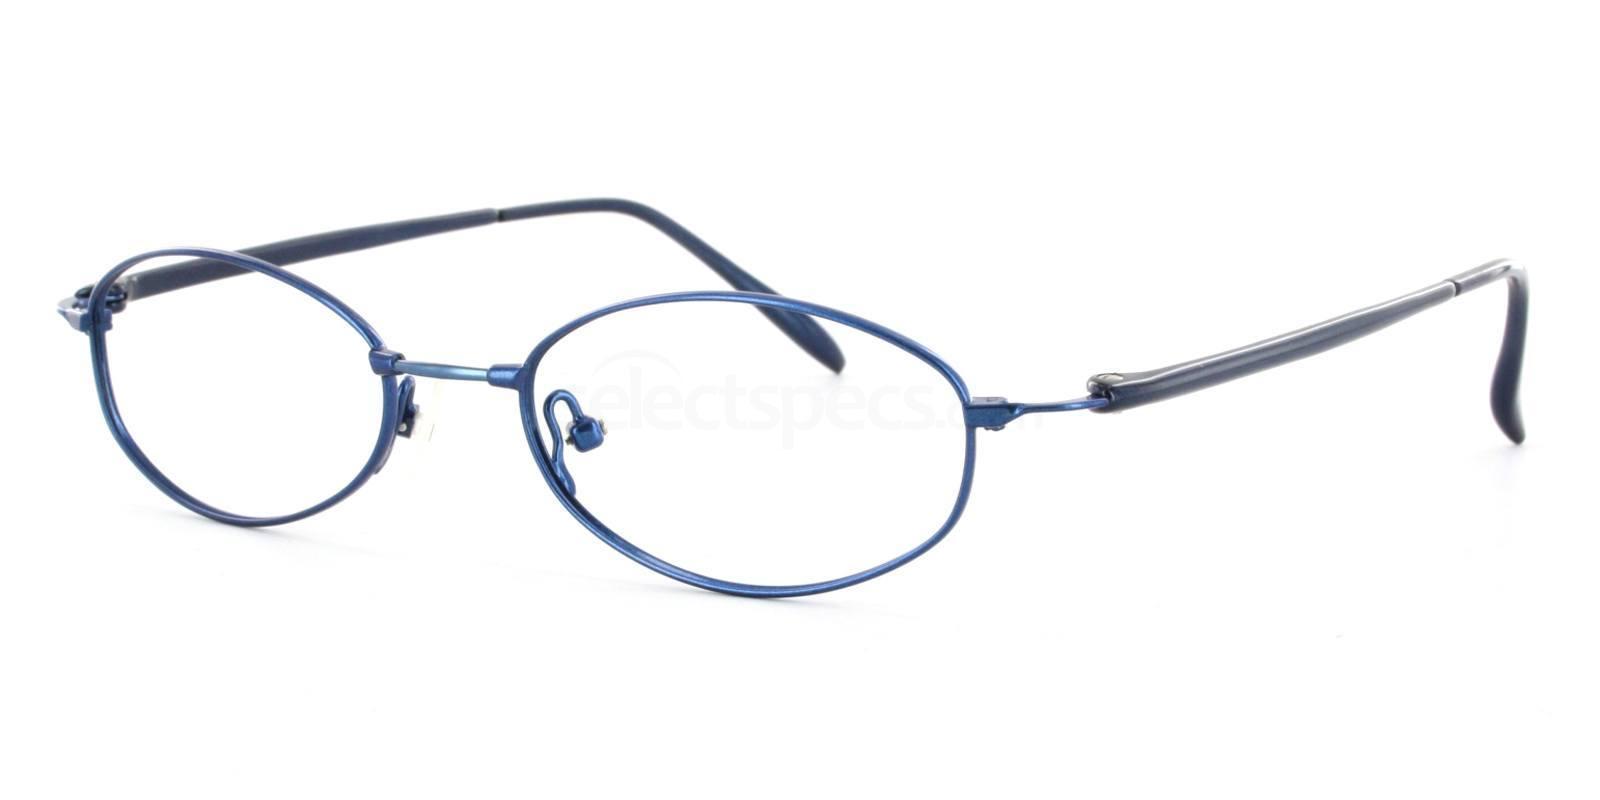 C06 A14 Glasses, Antares